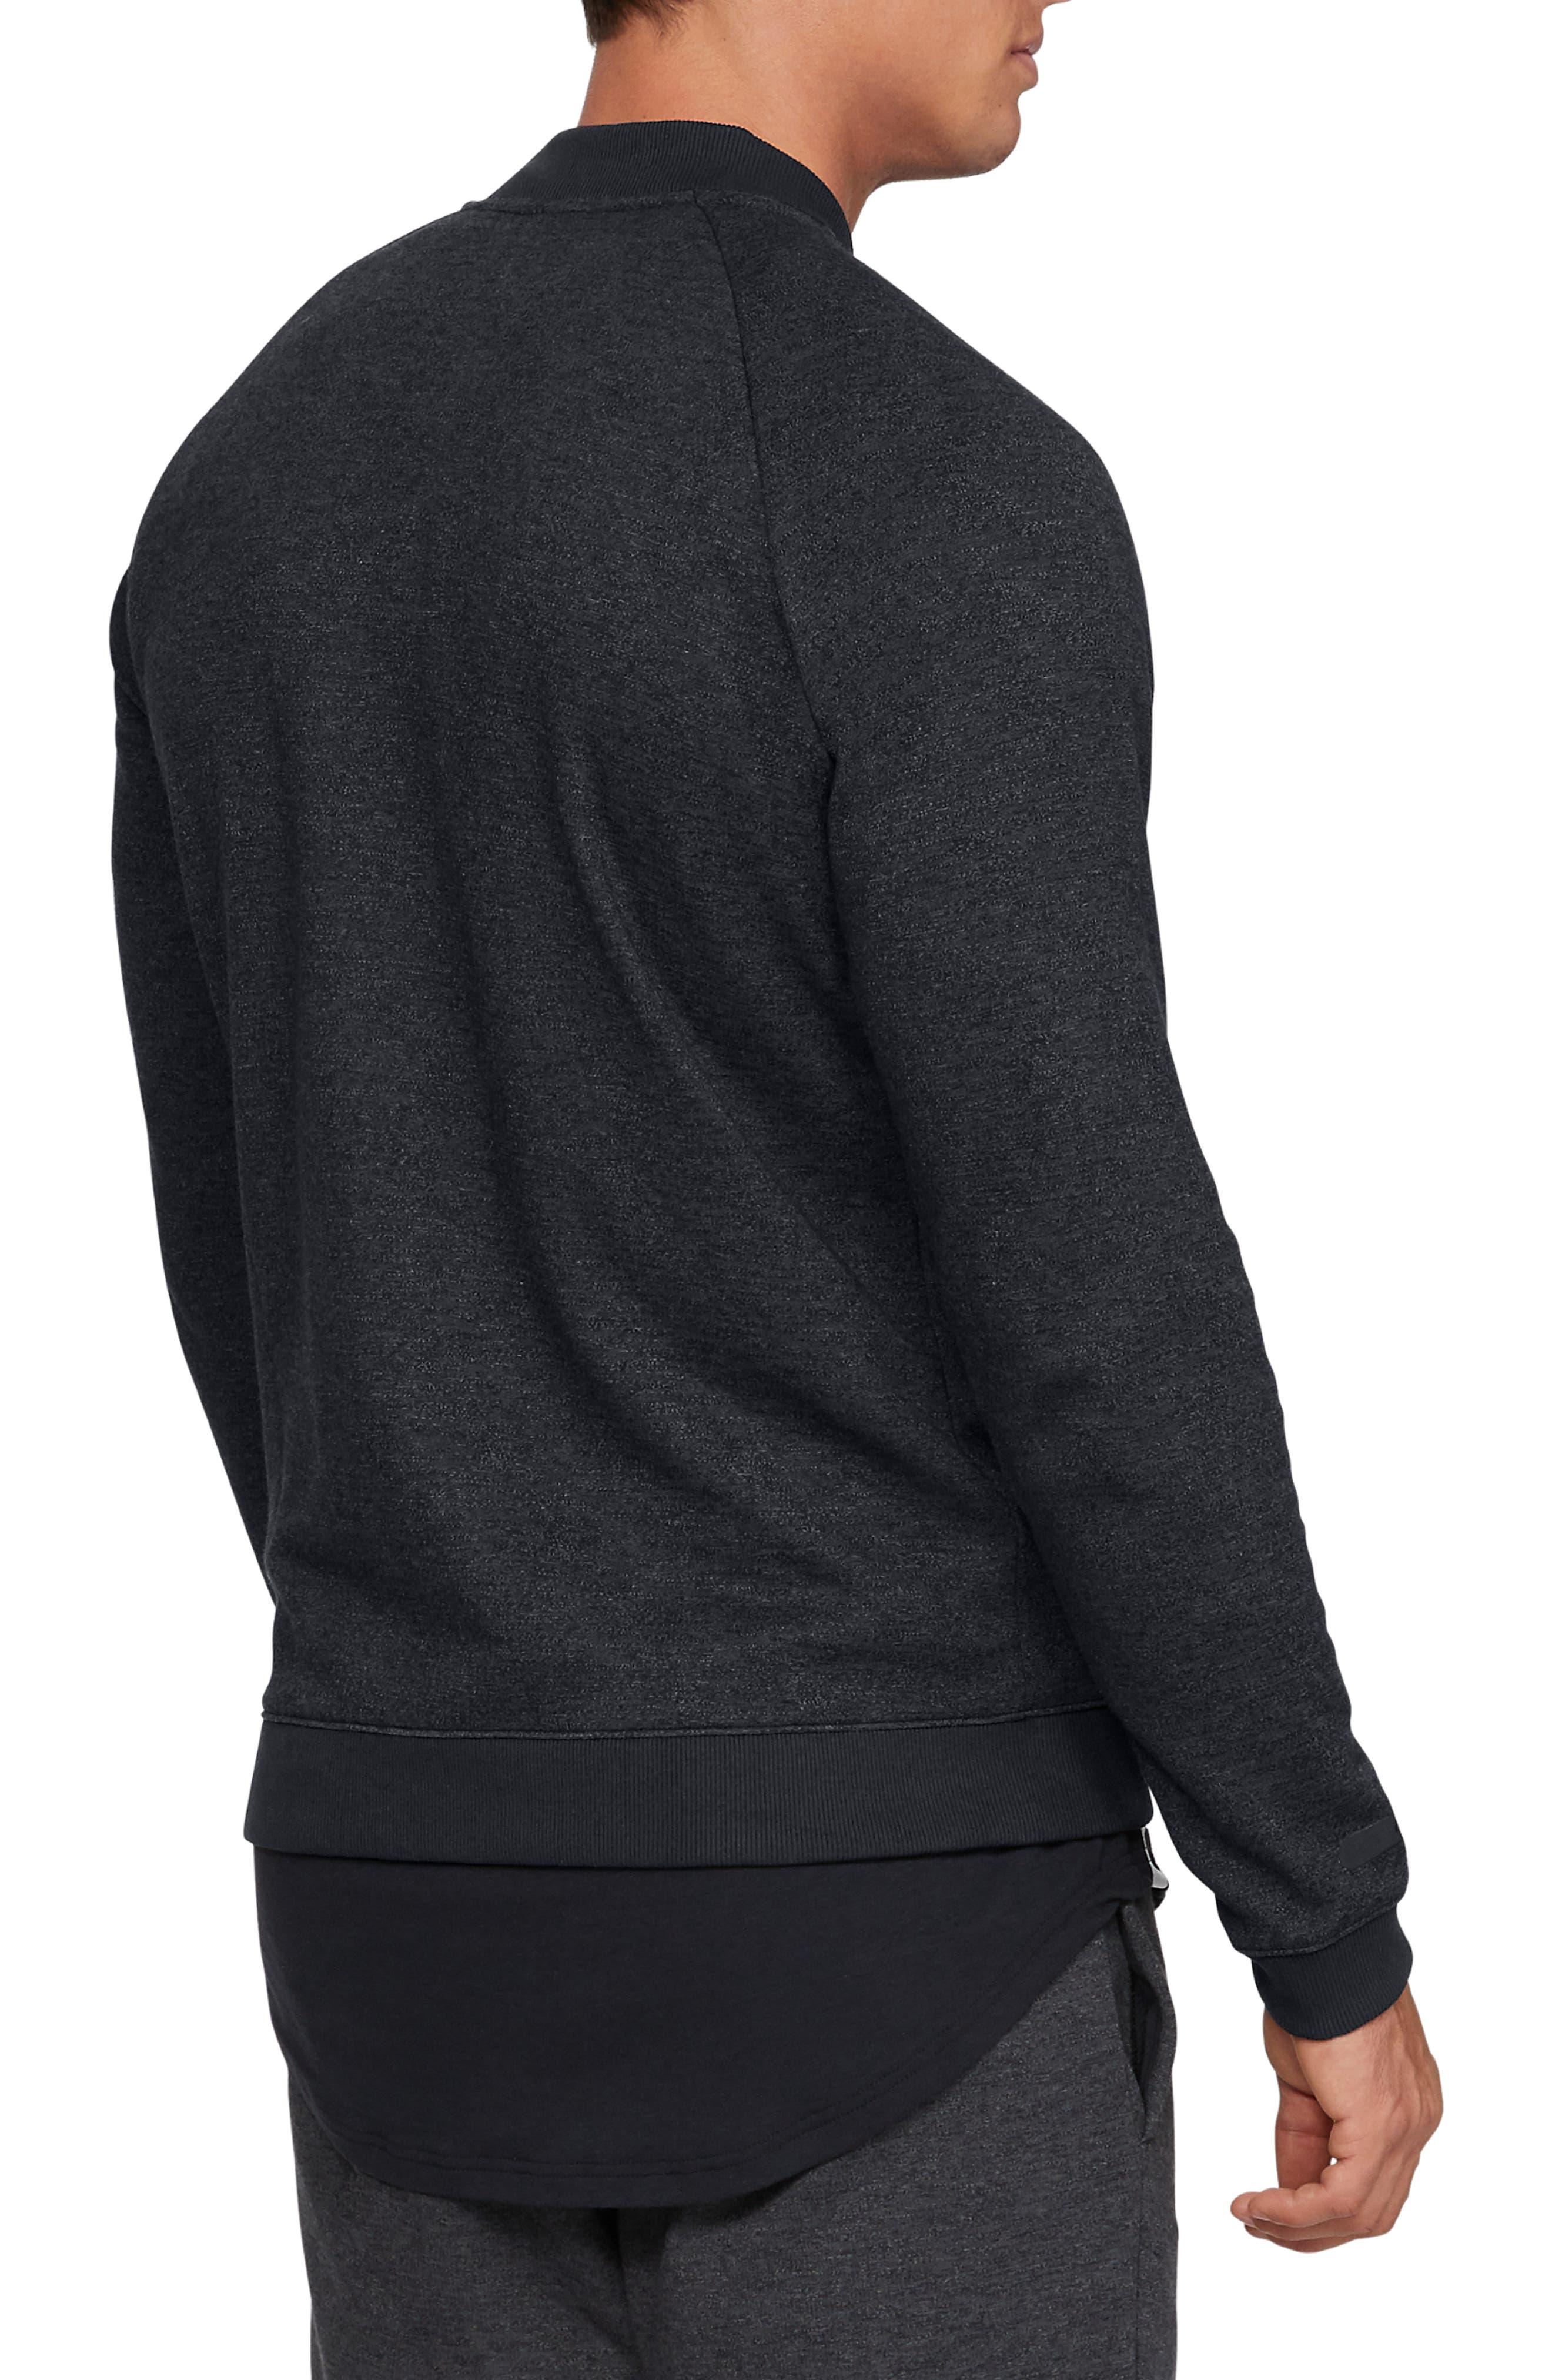 UNDER ARMOUR, Unstoppable Double Knit Bomber Jacket, Alternate thumbnail 2, color, BLACK/ BLACK/ BLACK